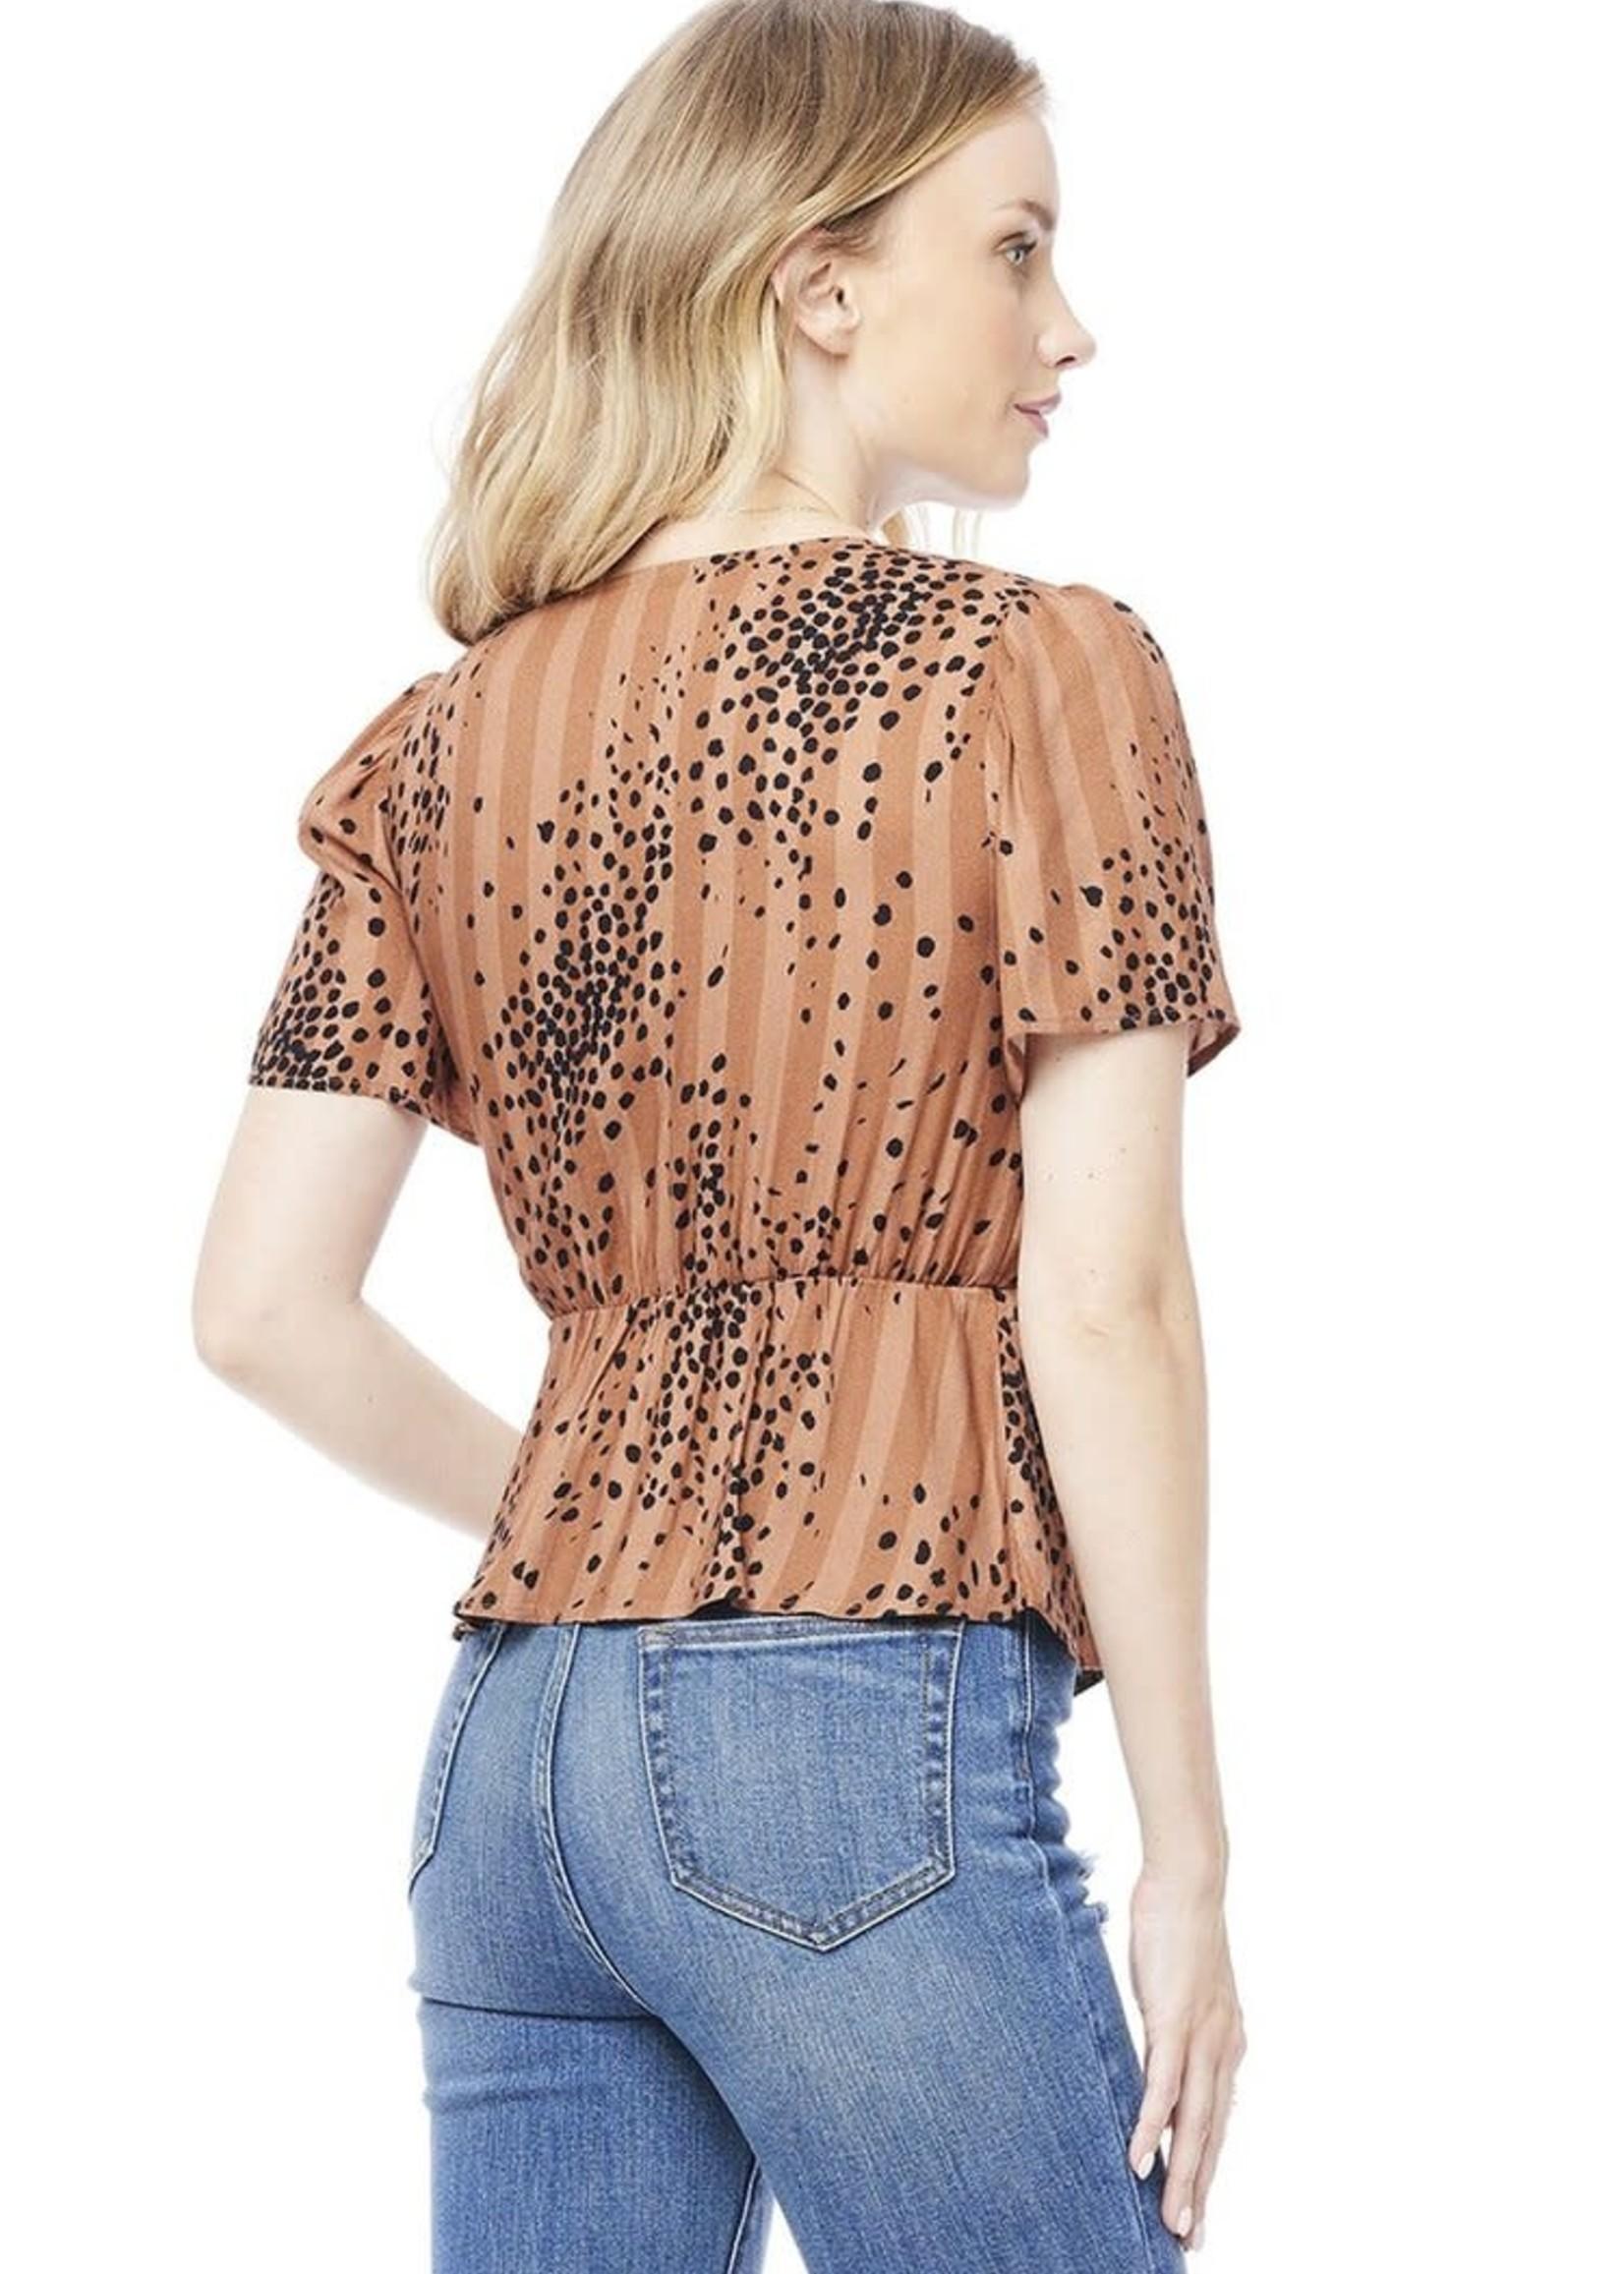 SALTWATER LUXE CINNAMON blouse